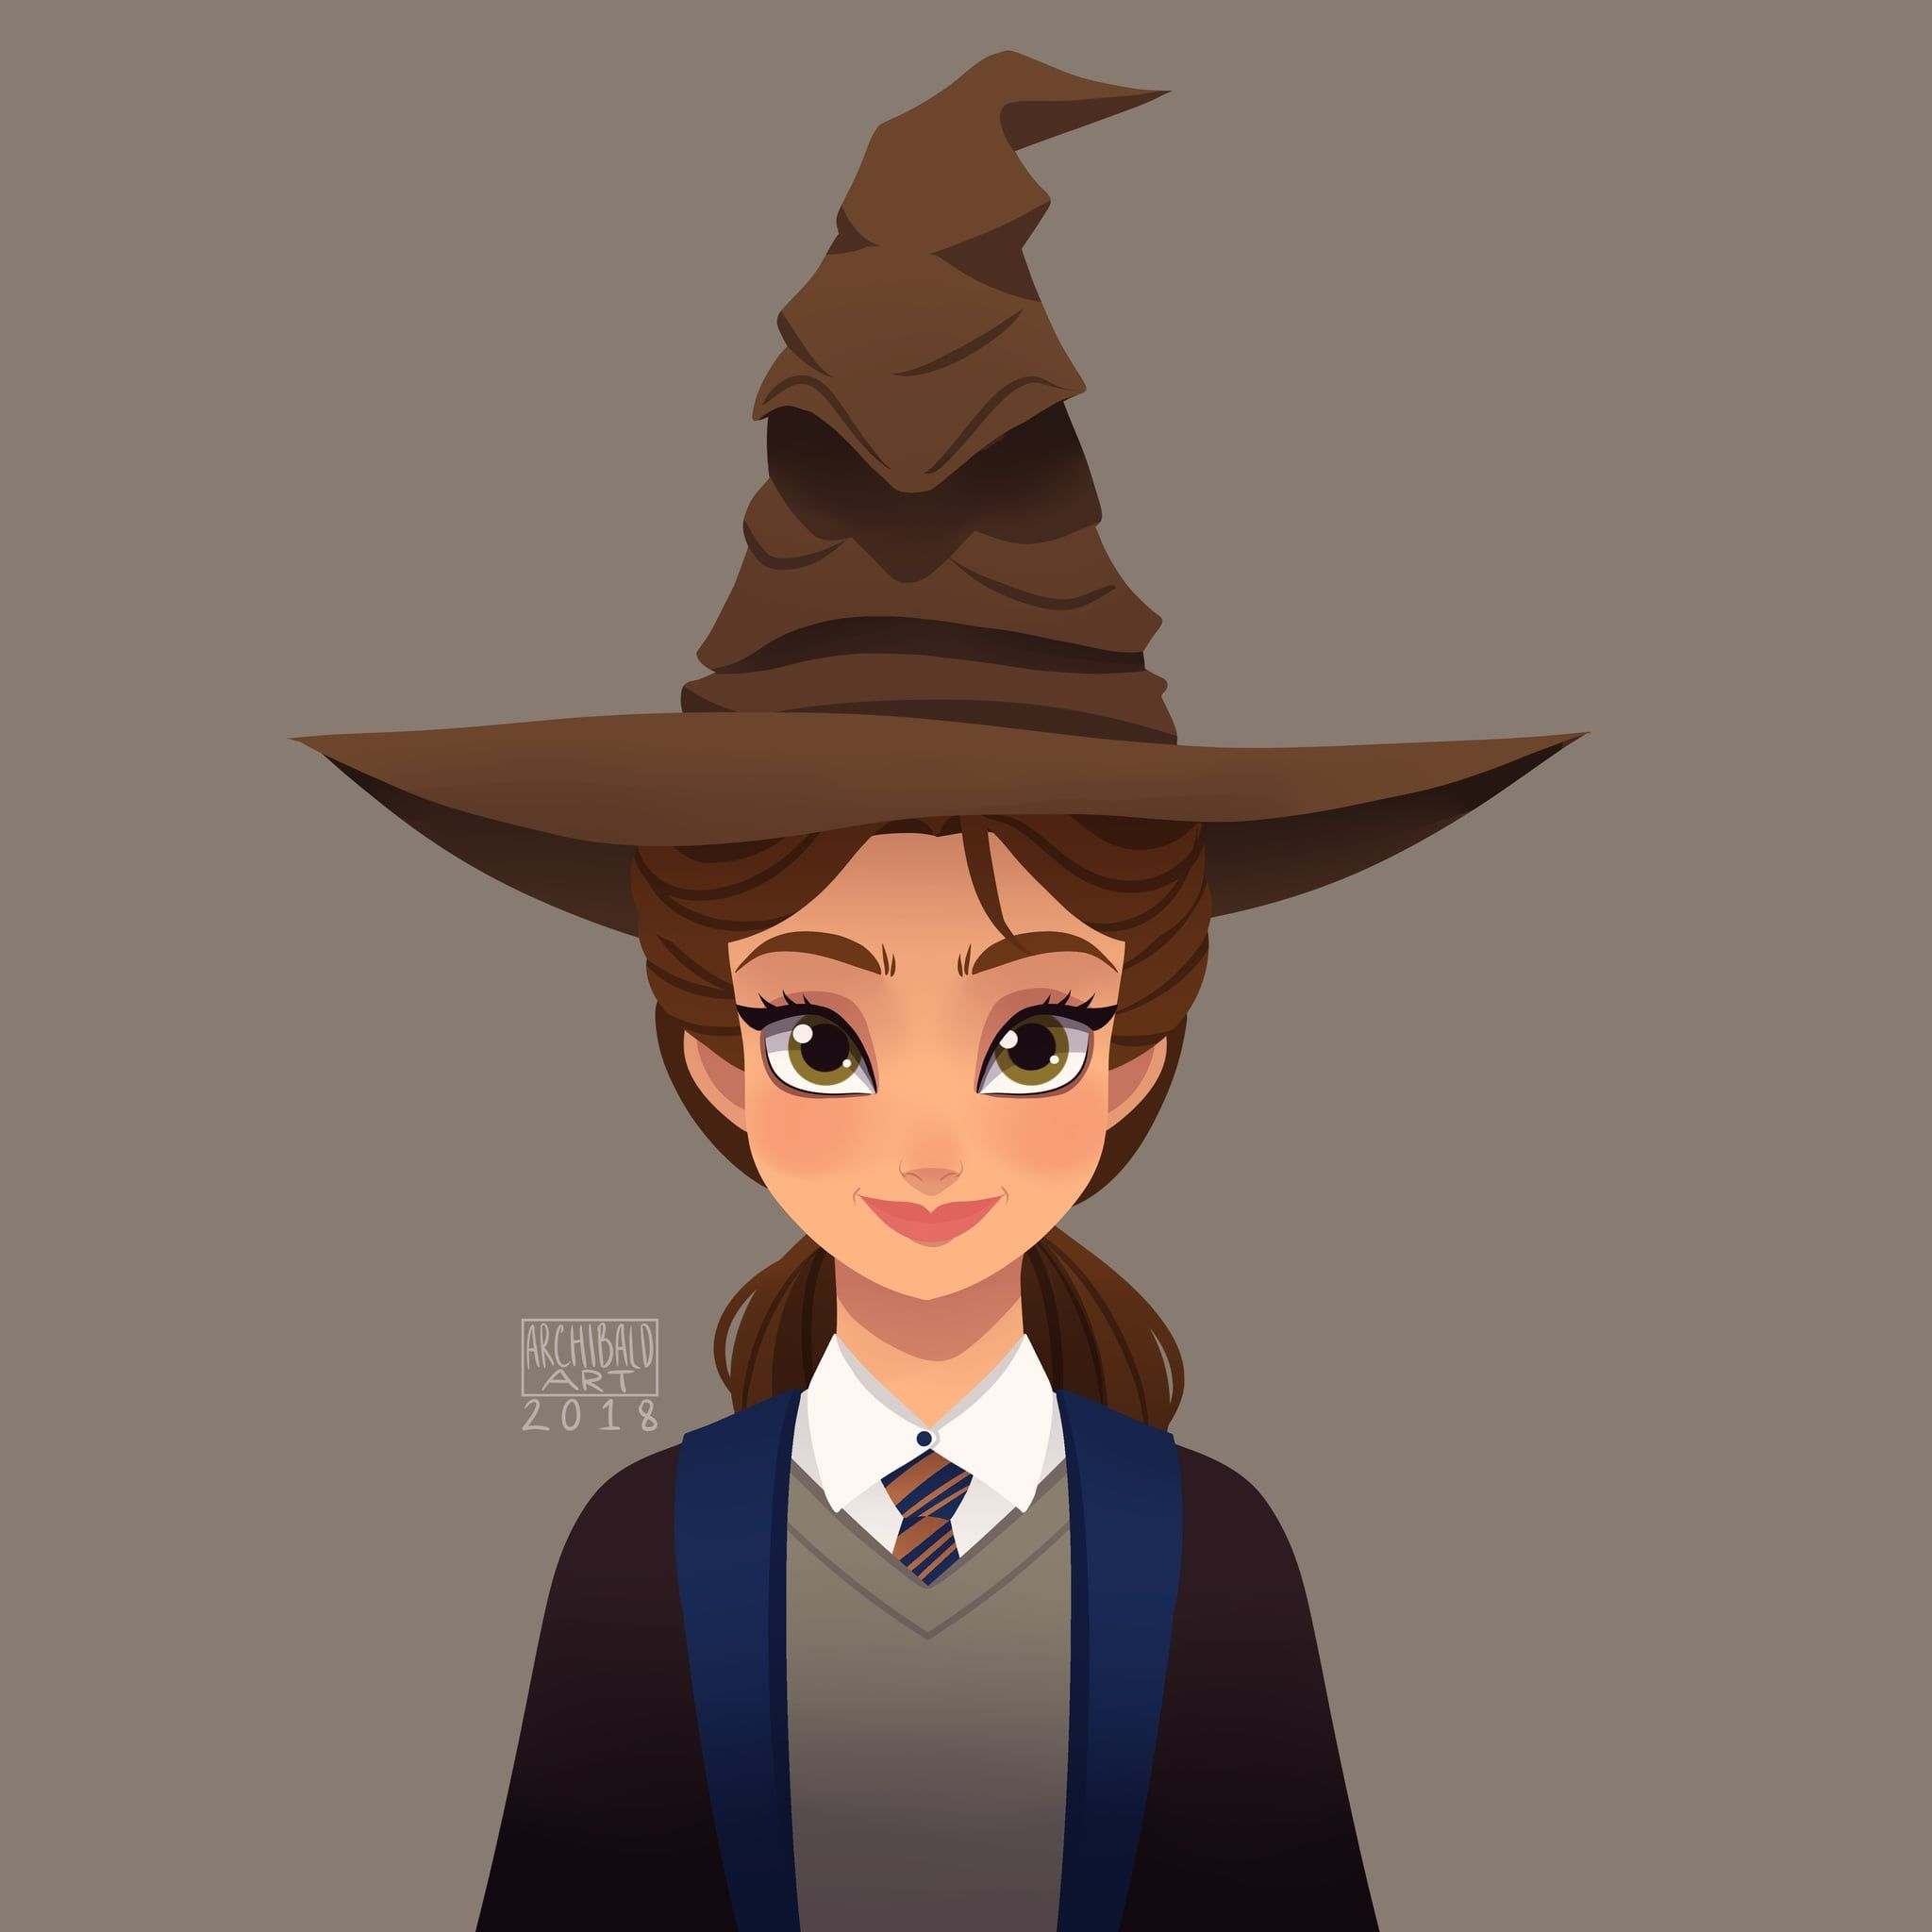 Belle As A Harry Potter Character Harry Potter Disney Disney Hogwarts Disney Princess Fan Art